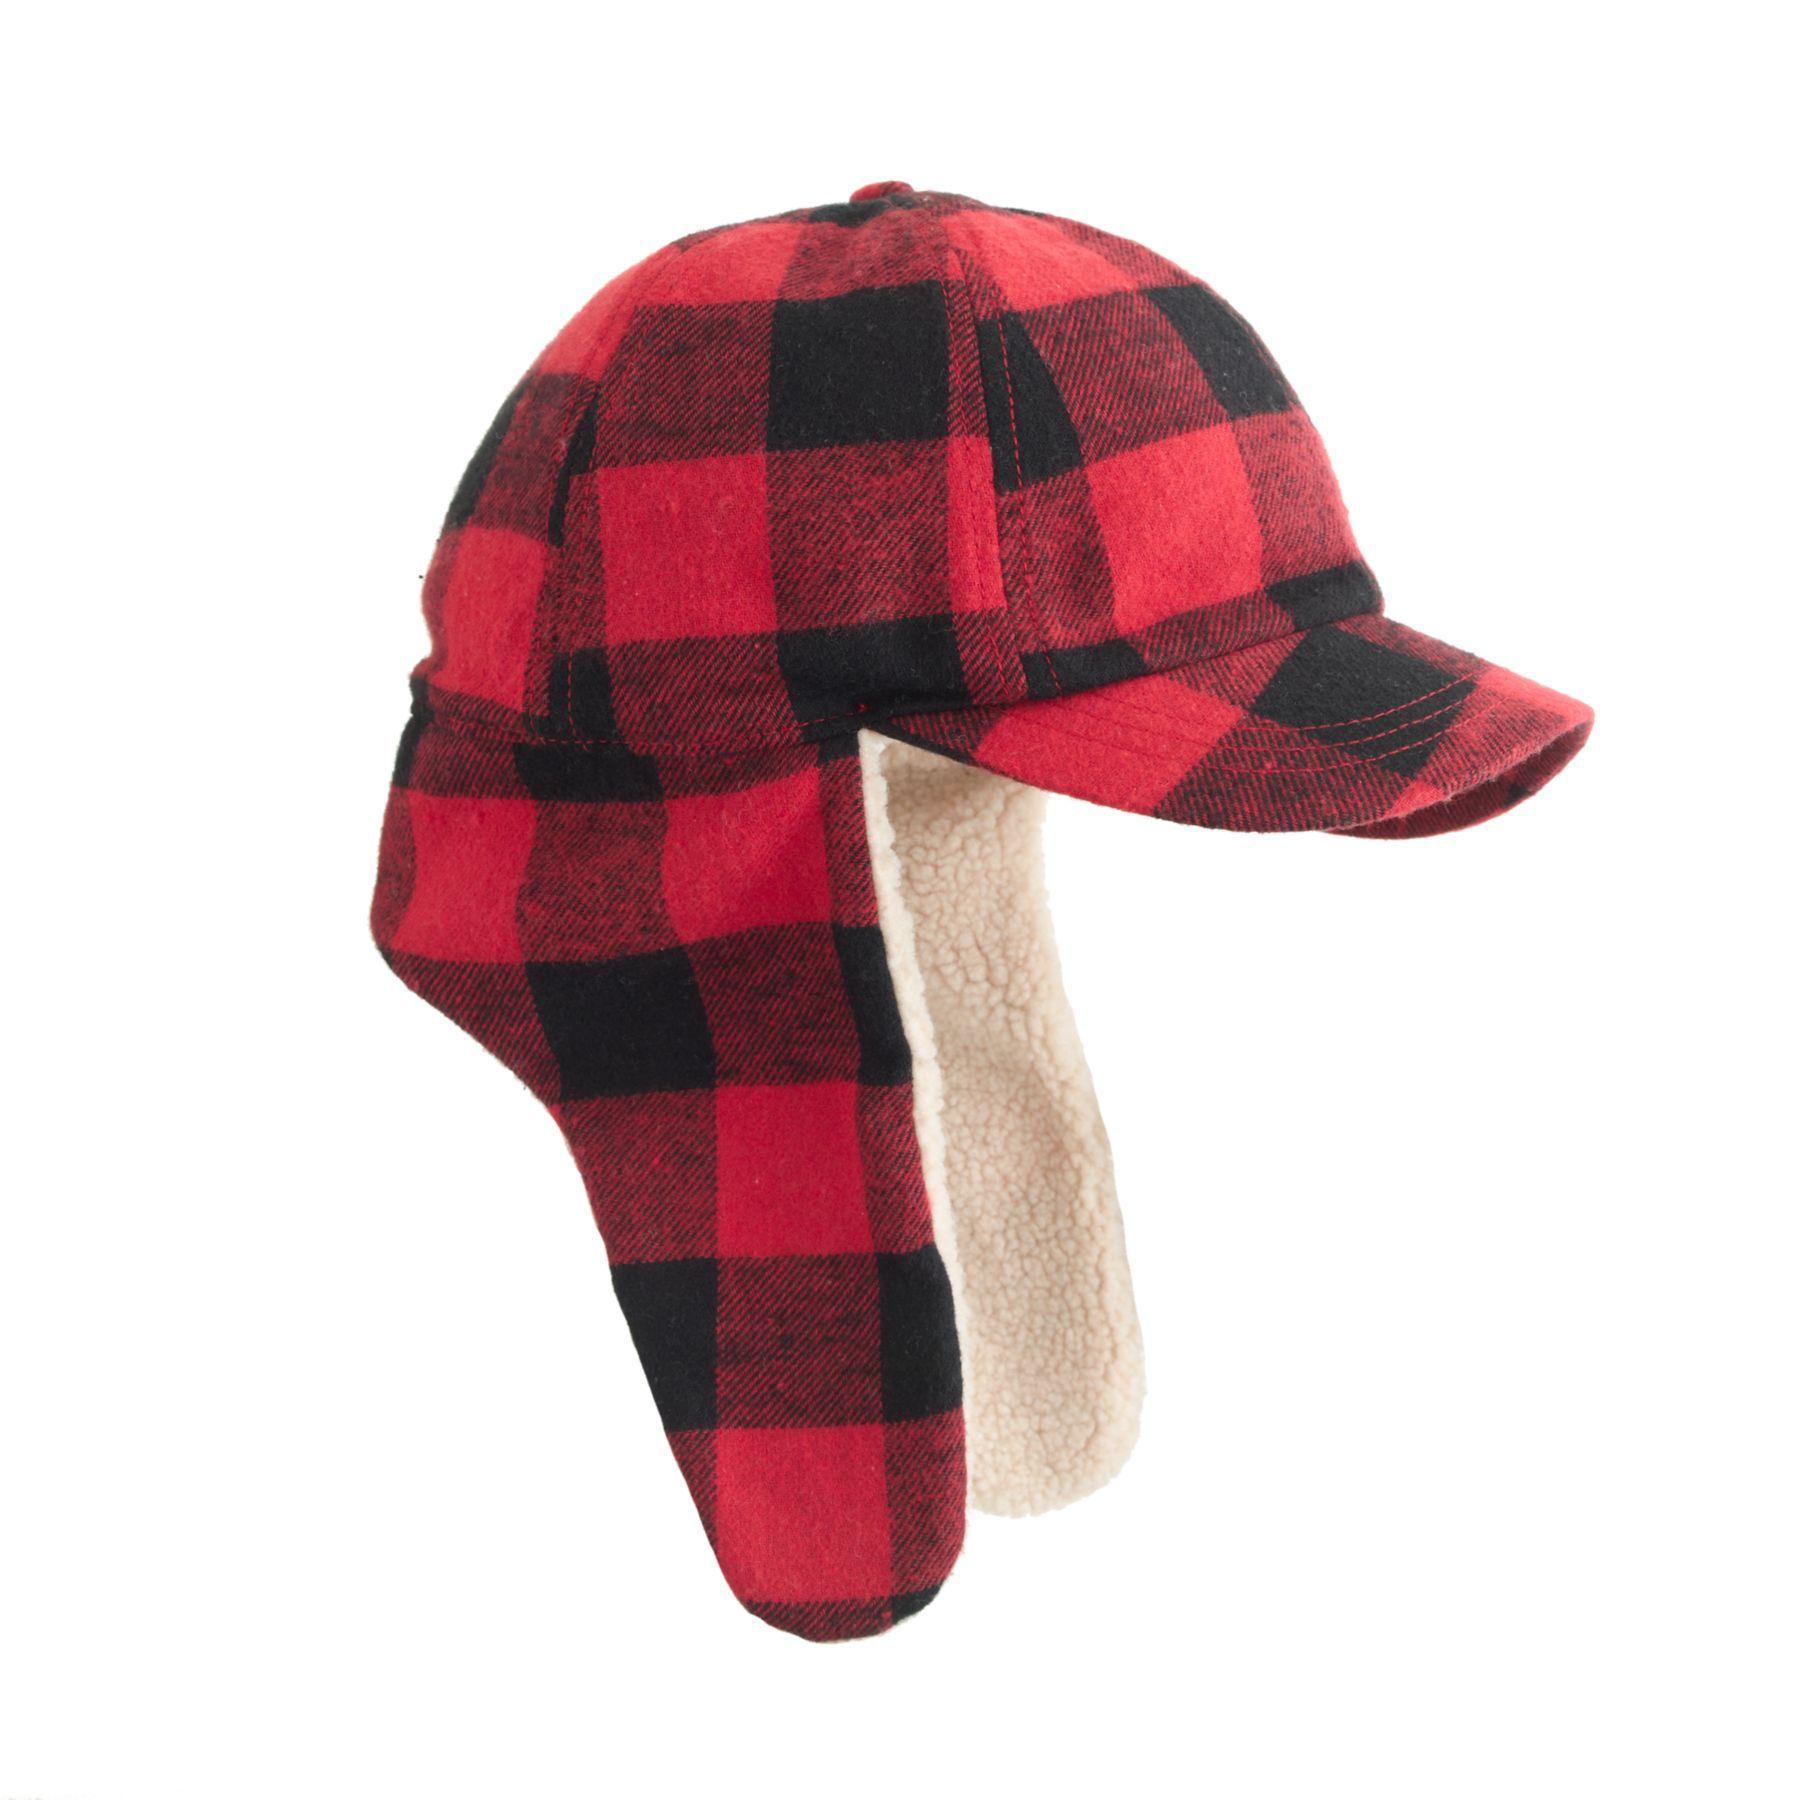 8a63453e123 J.Crew kids  trapper hat in red and black buffalo check.